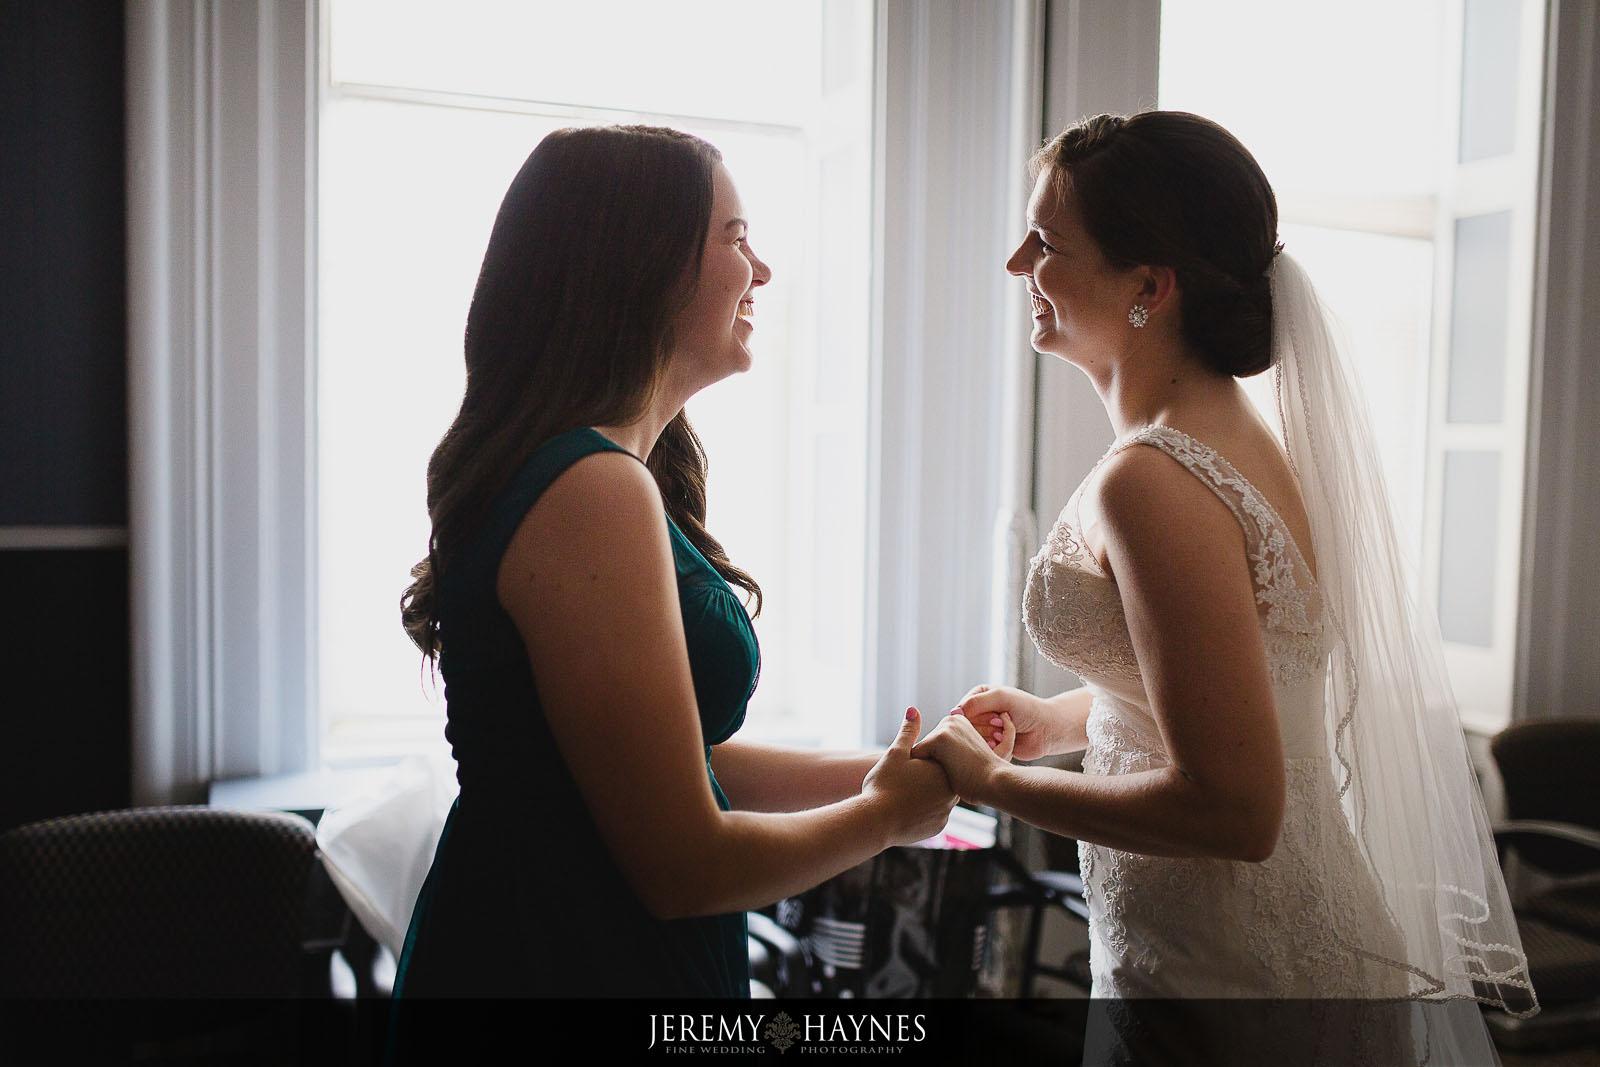 st-louis-bertrand-catholic-church-wedding-6.jpg